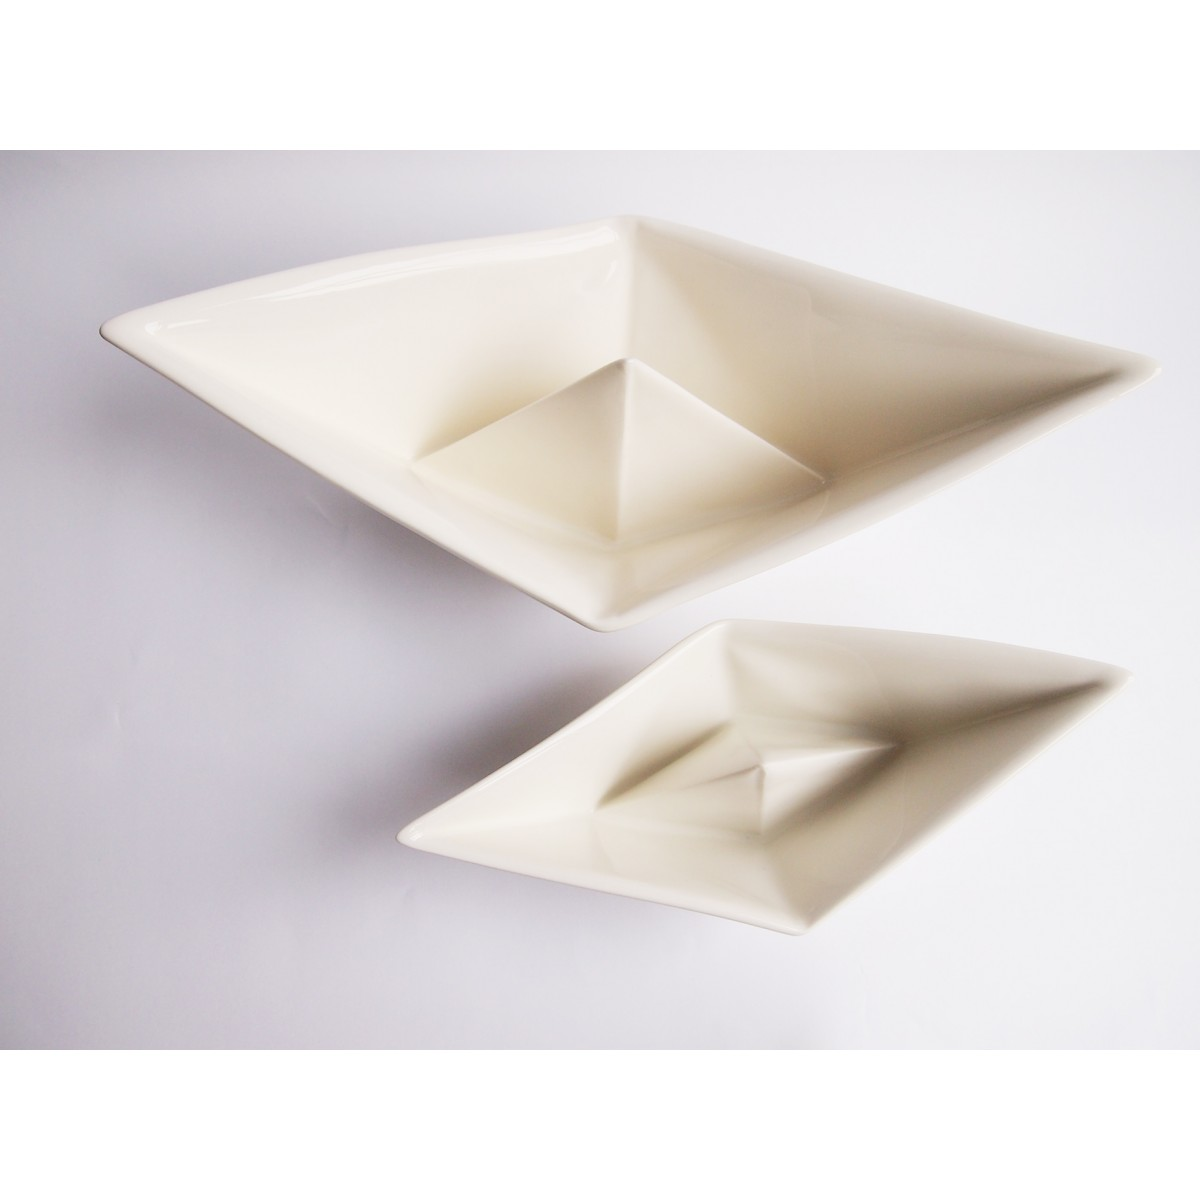 moij design Origami Schiffchen Schale 'bootje'